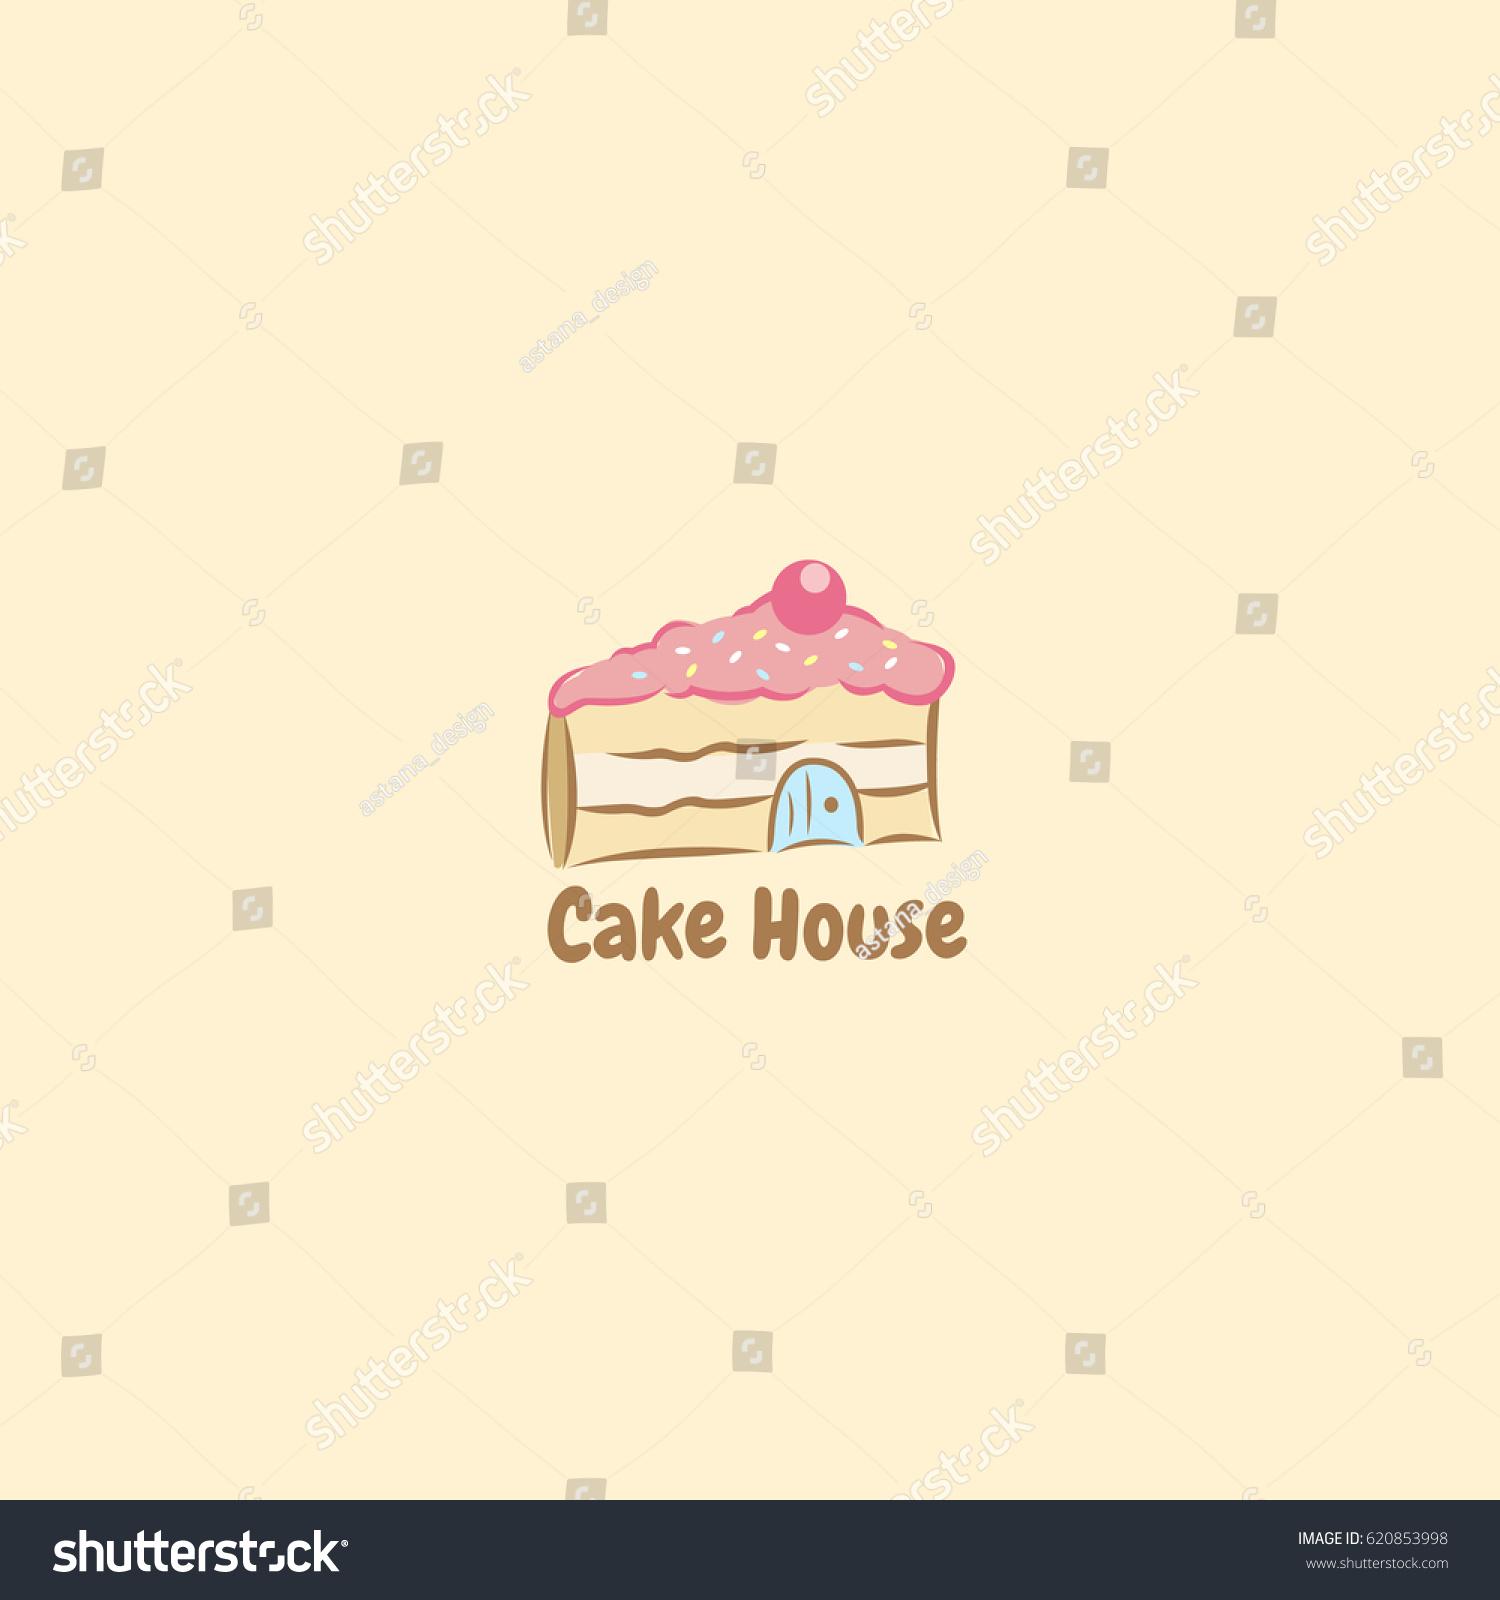 Cake House Logo Stock Vector Royalty Free 620853998 Shutterstock